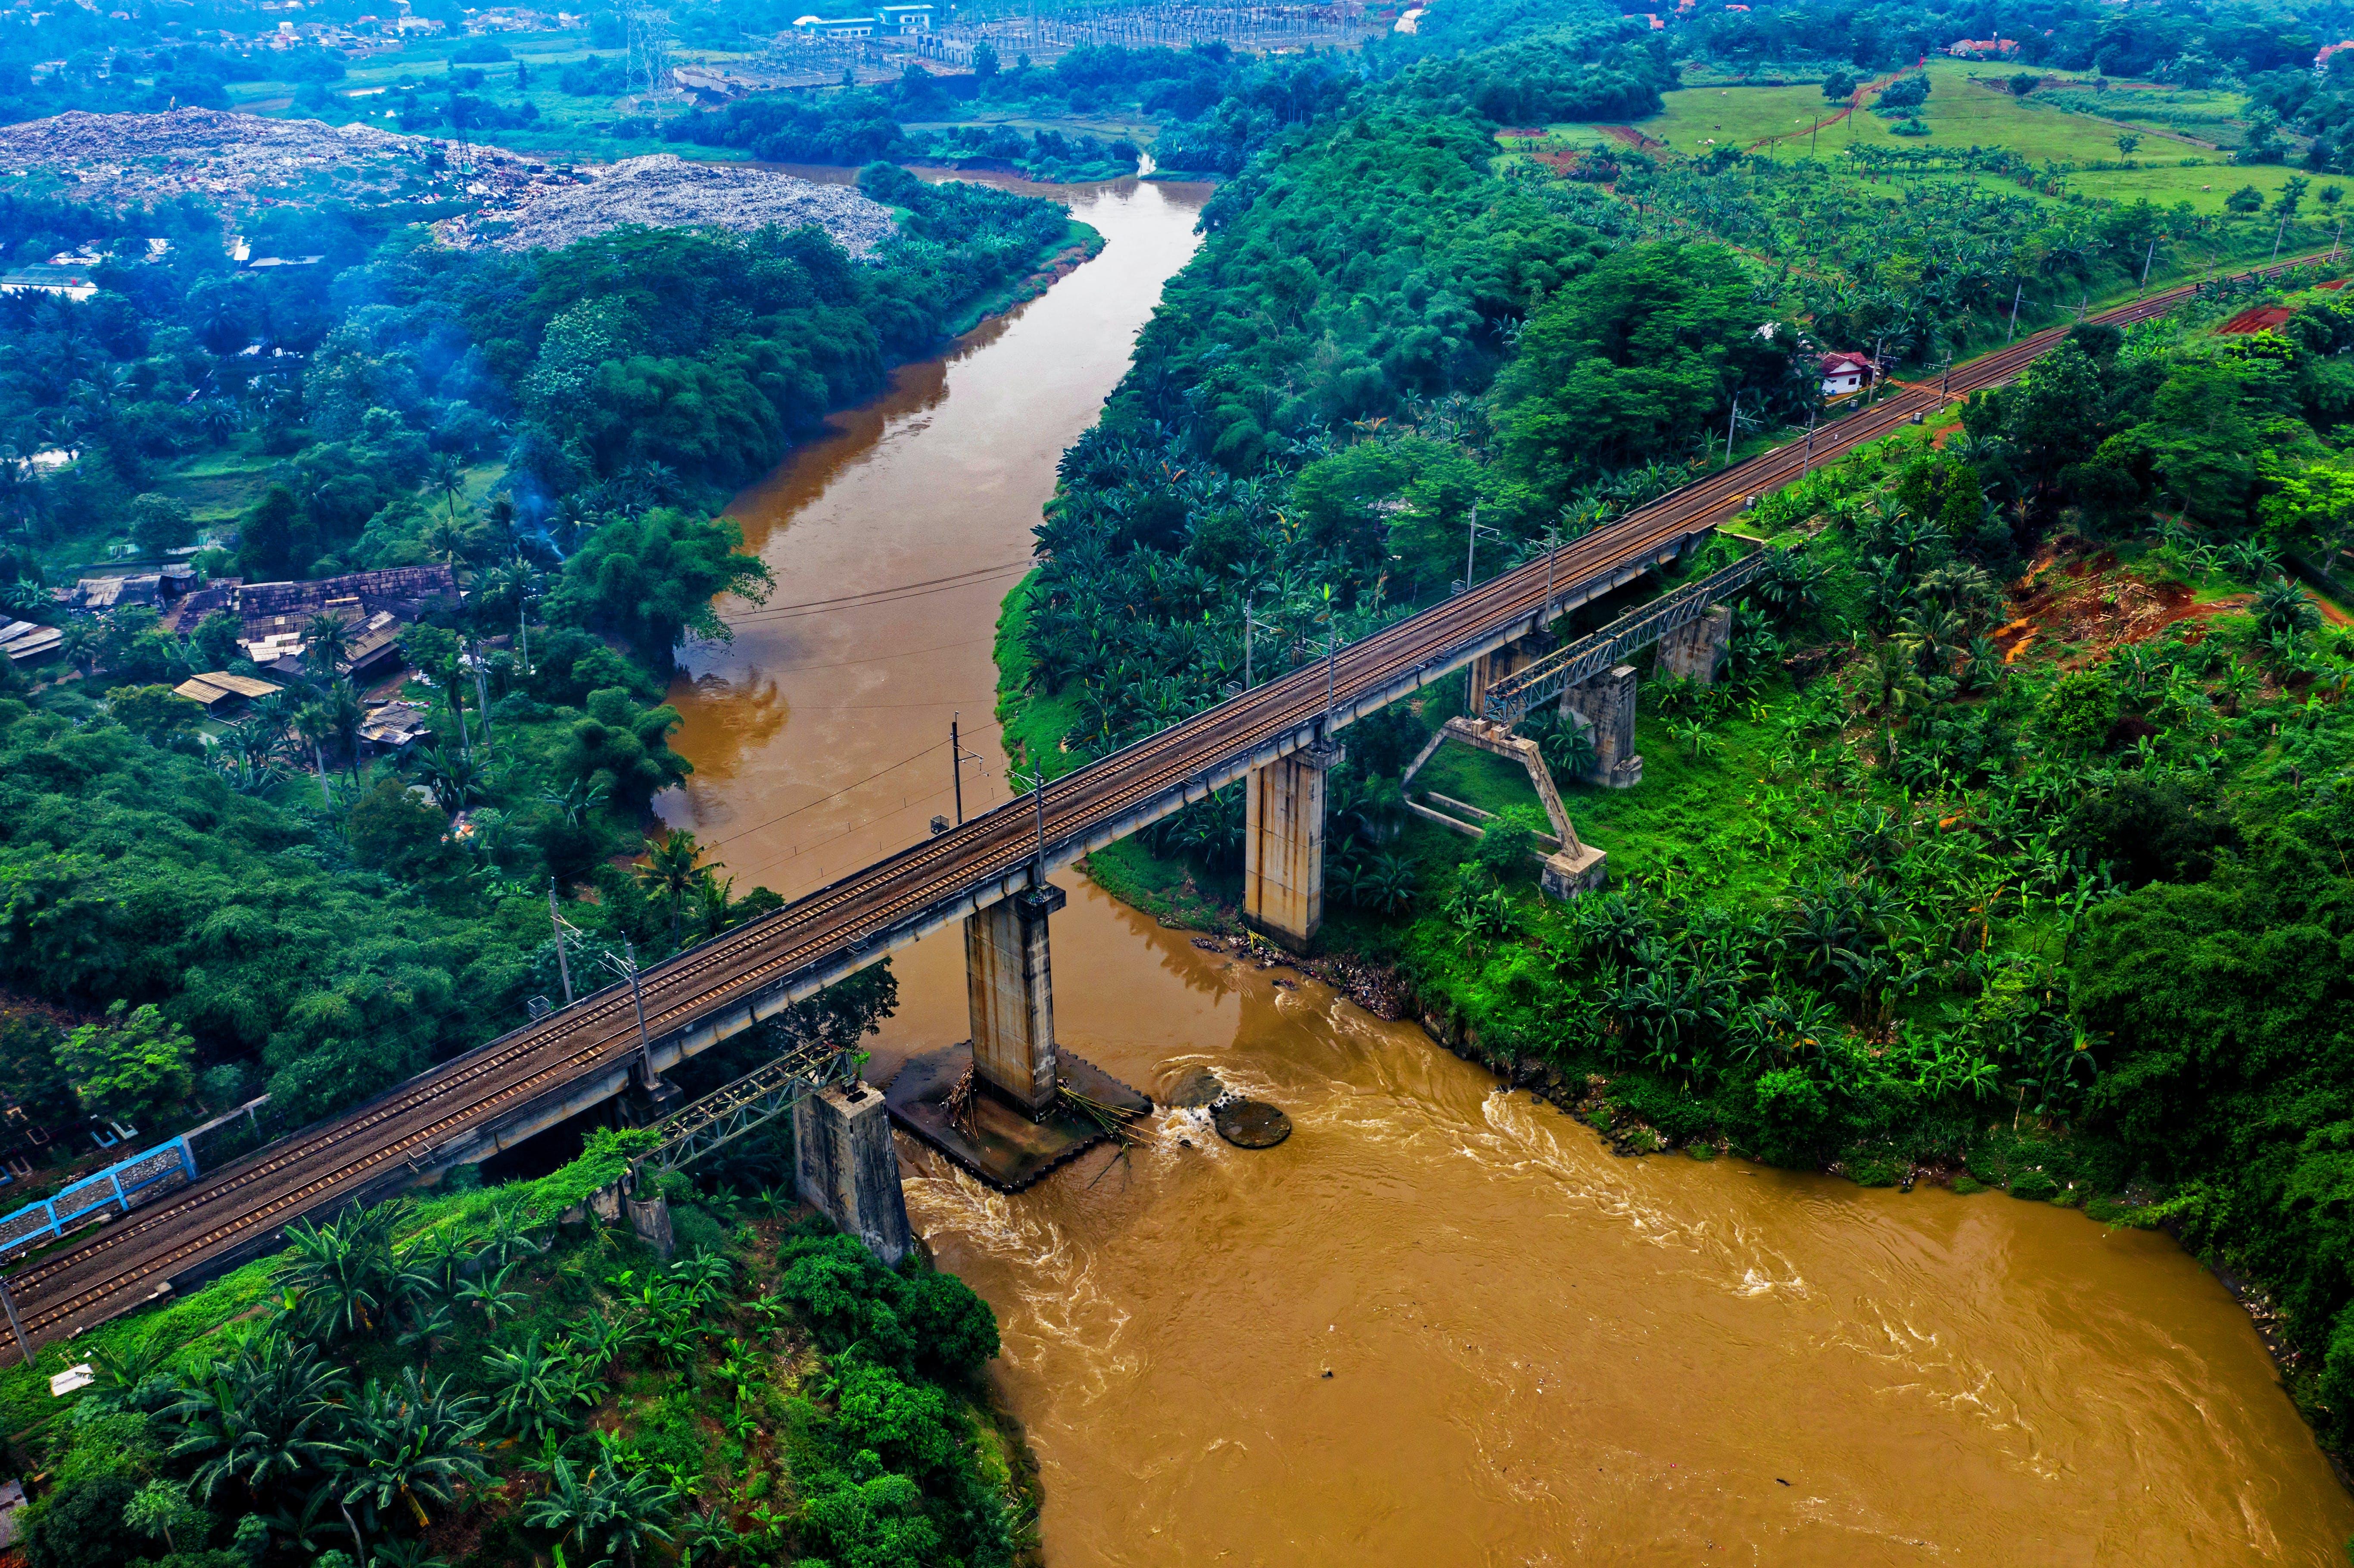 Aerial Photo of Railway